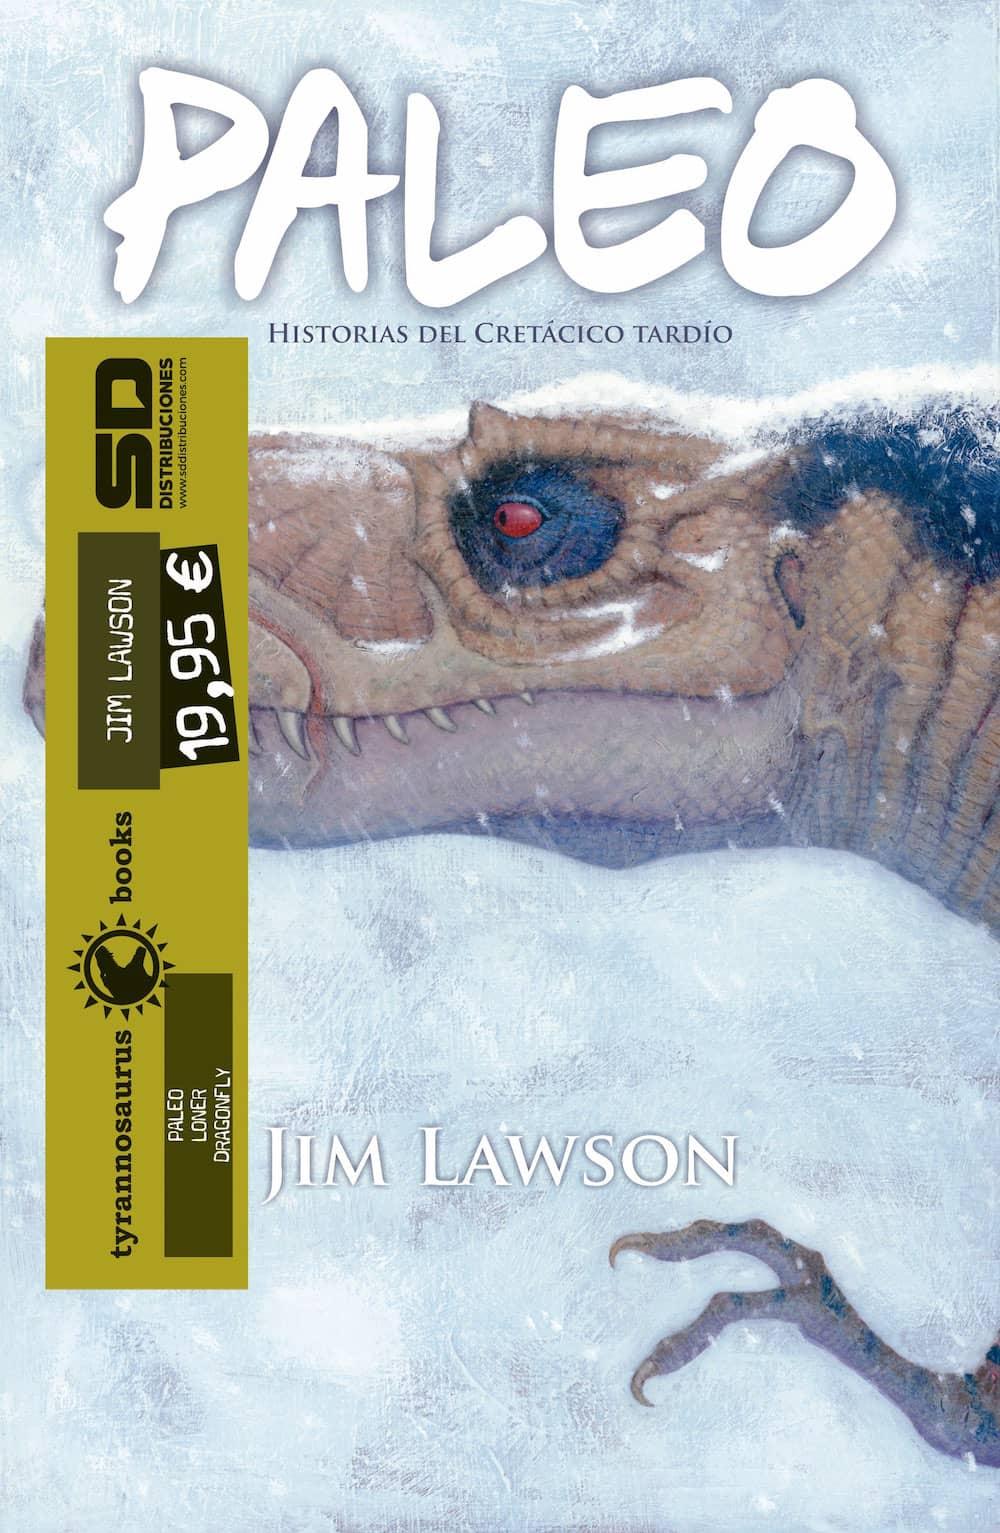 PACK JIM LAWSON  (DRAGONFLY+LONER+PALEO)